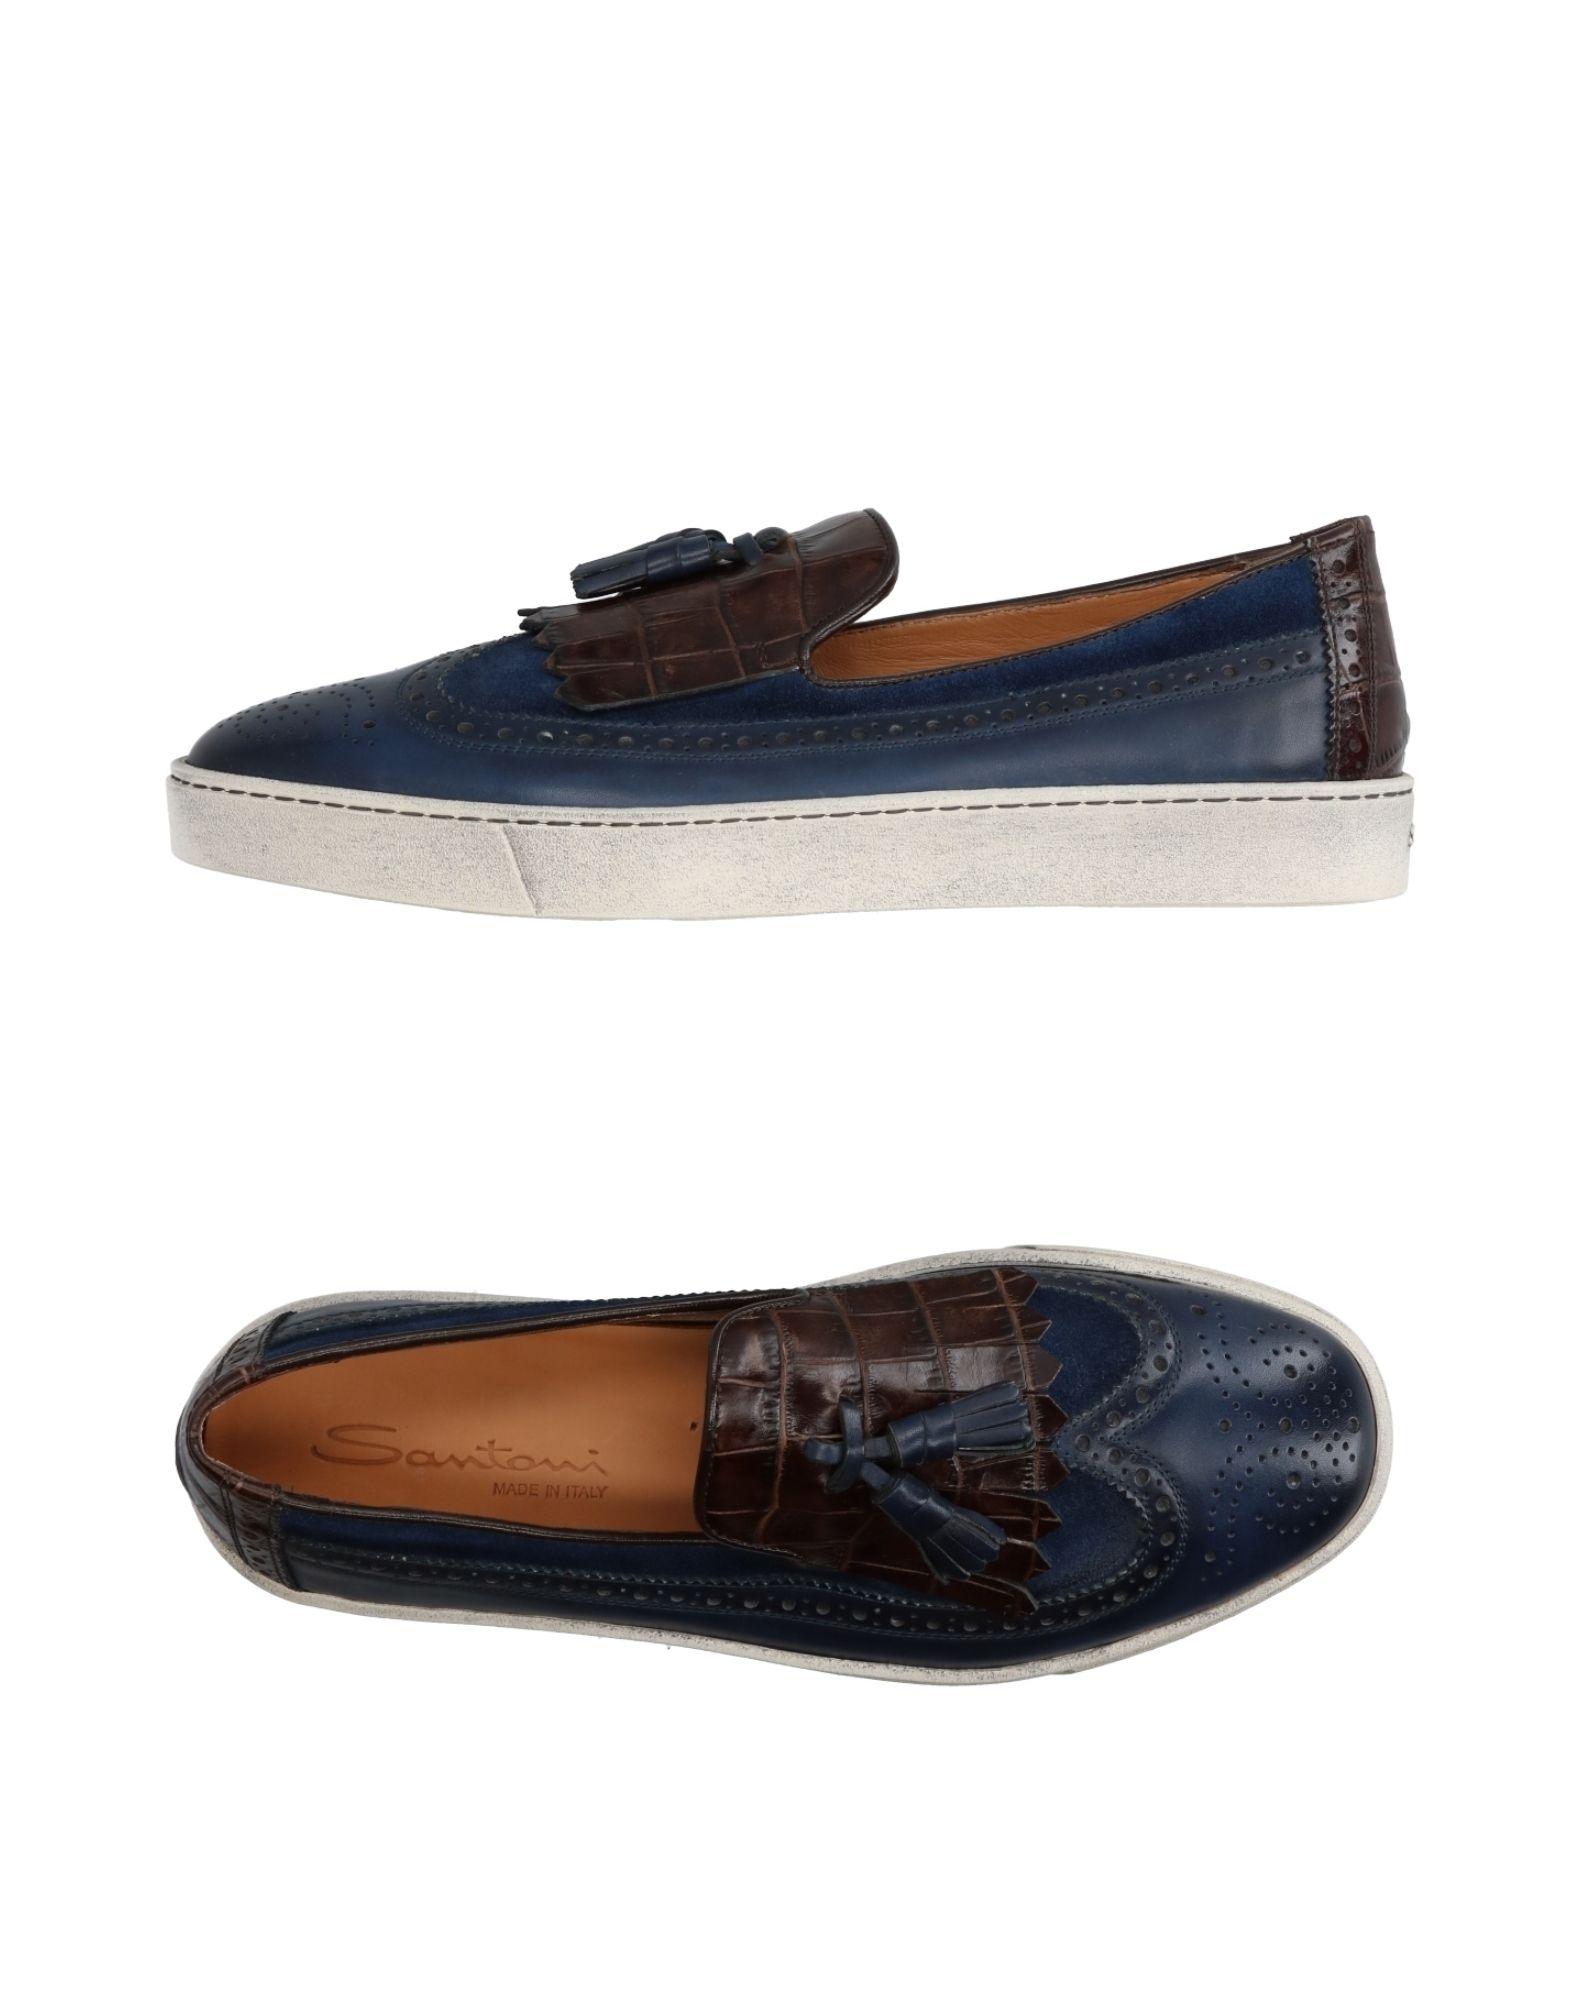 Santoni Mokassins Herren  Heiße 11304953MO Heiße  Schuhe c5230a